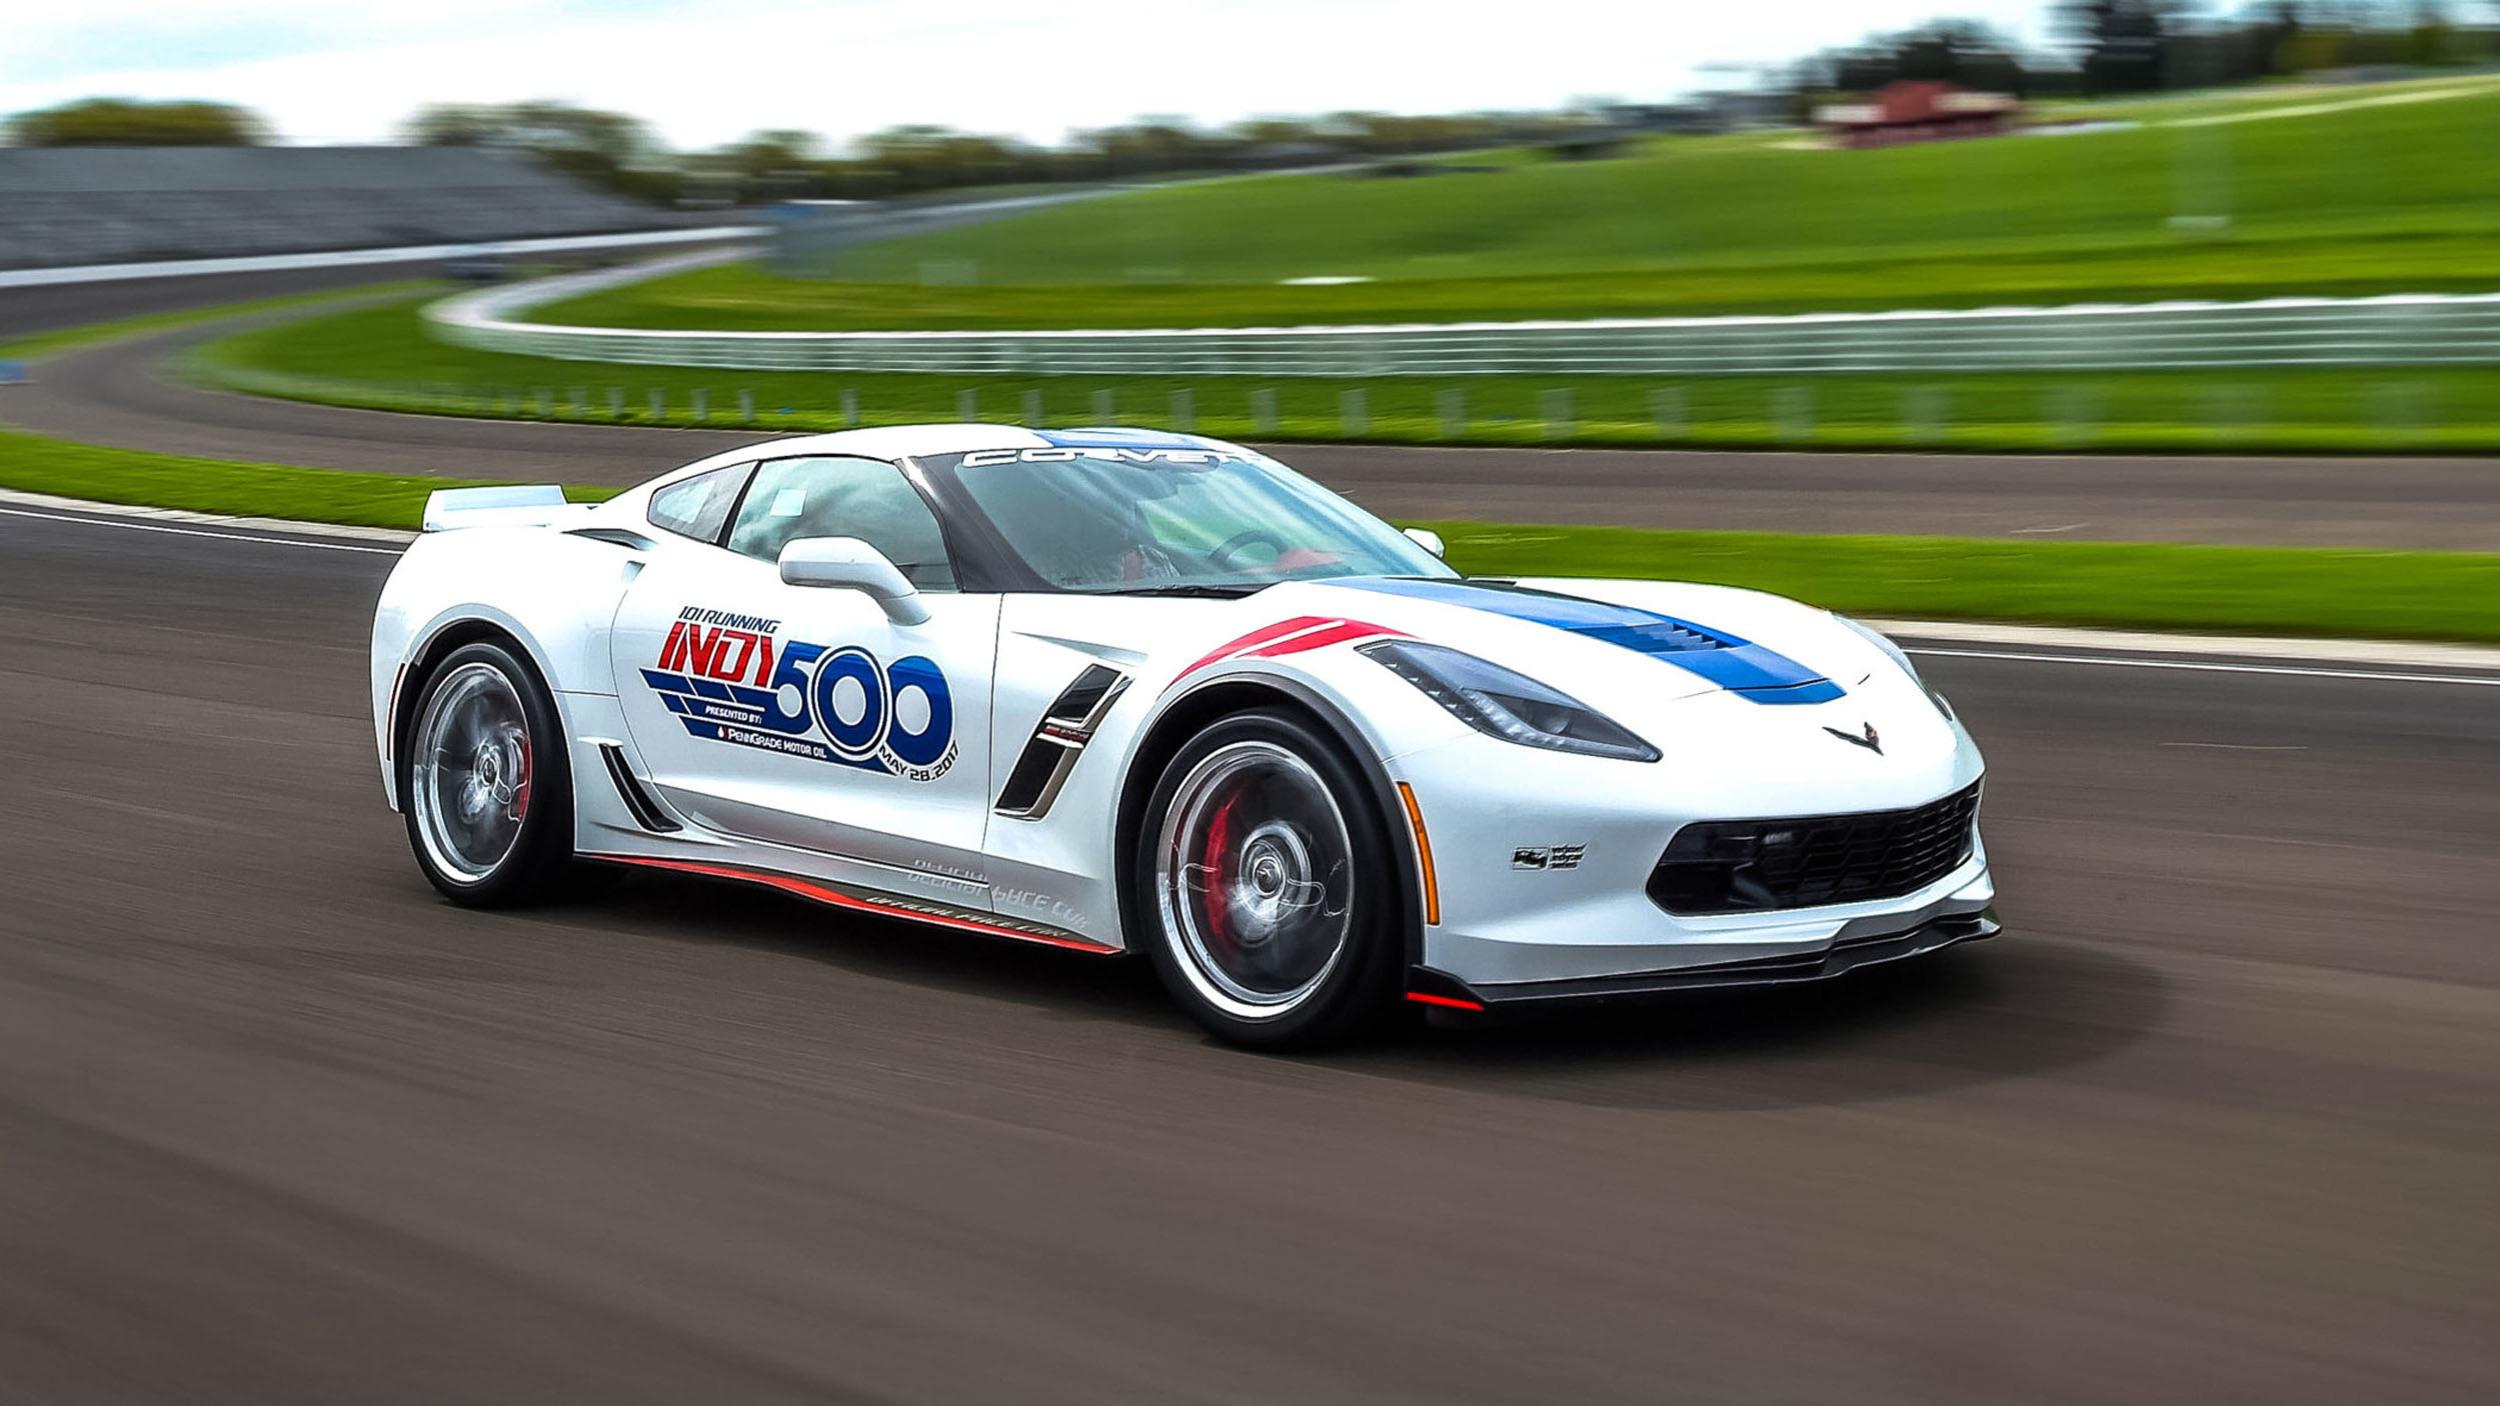 Chevrolet Corvette Grand Sport pace car Indy 500 (6)